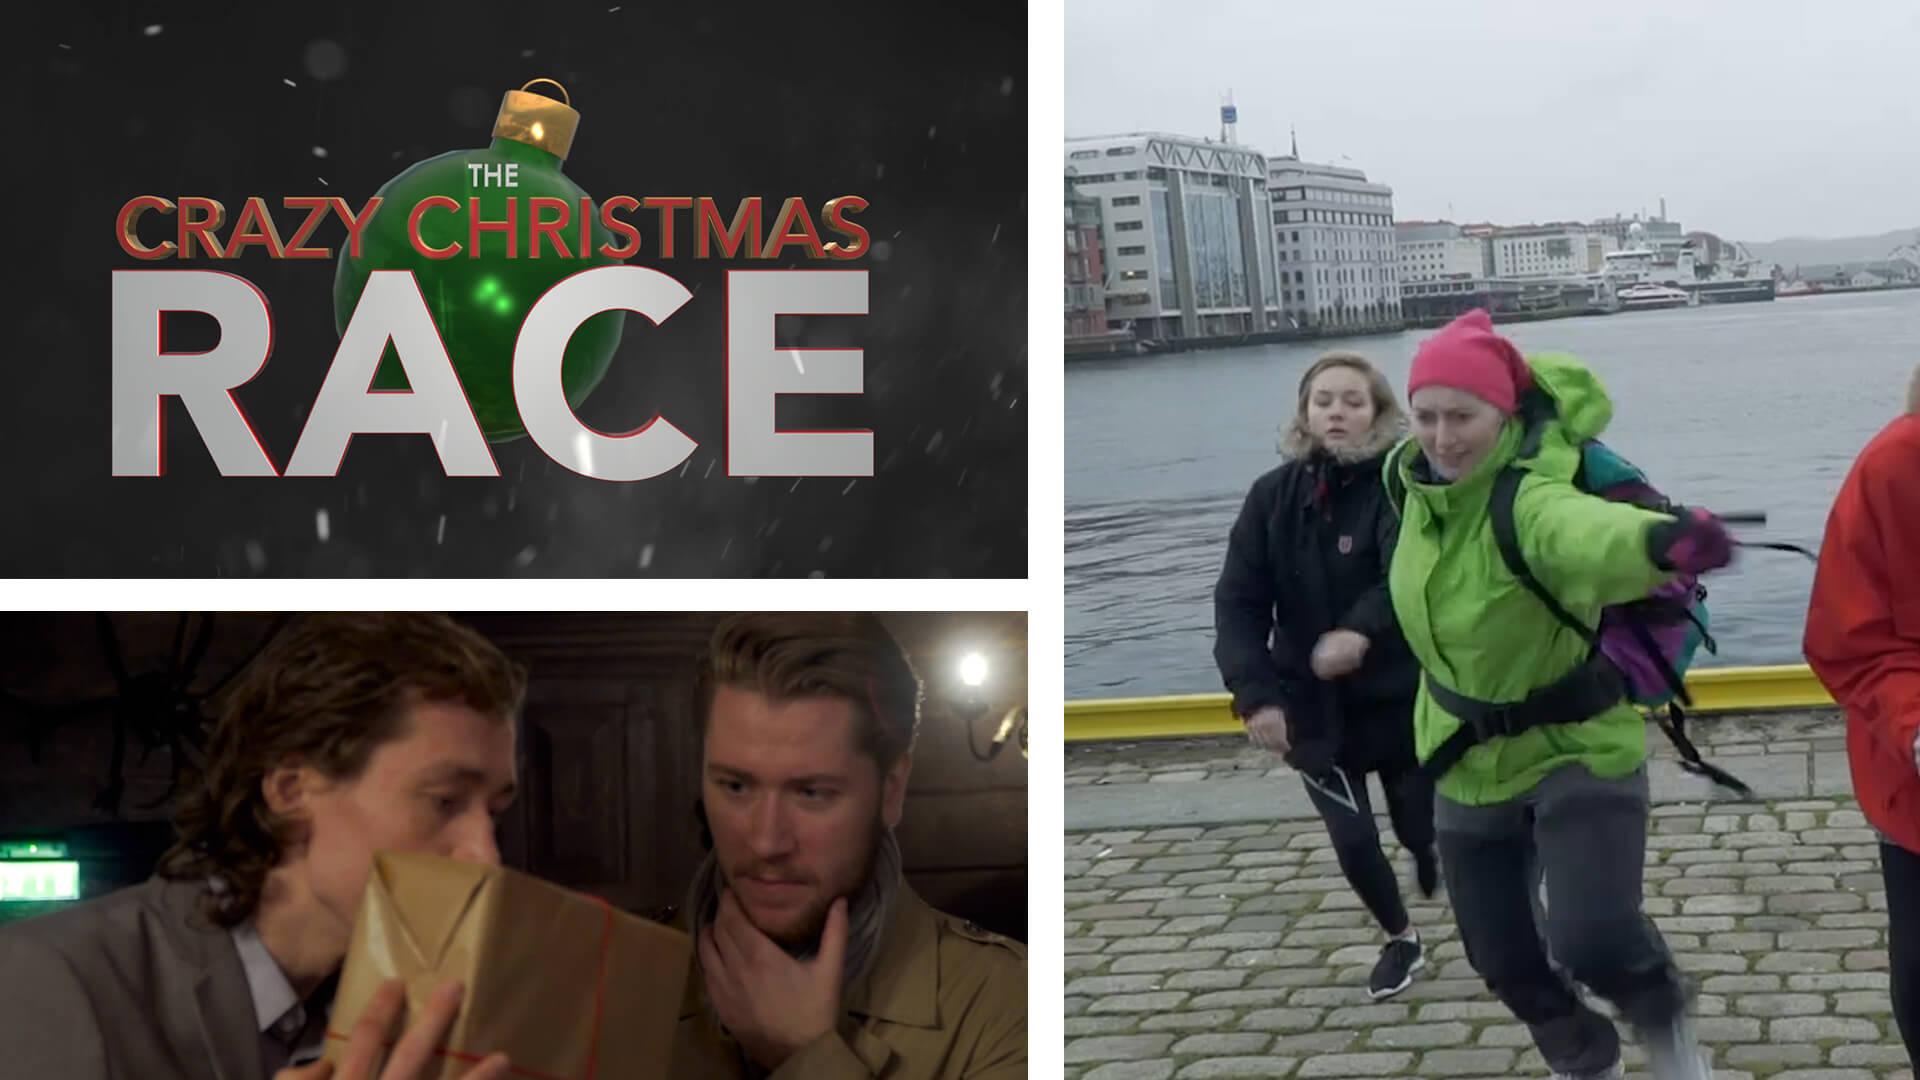 The Crazy Christmas Race – Episode 2